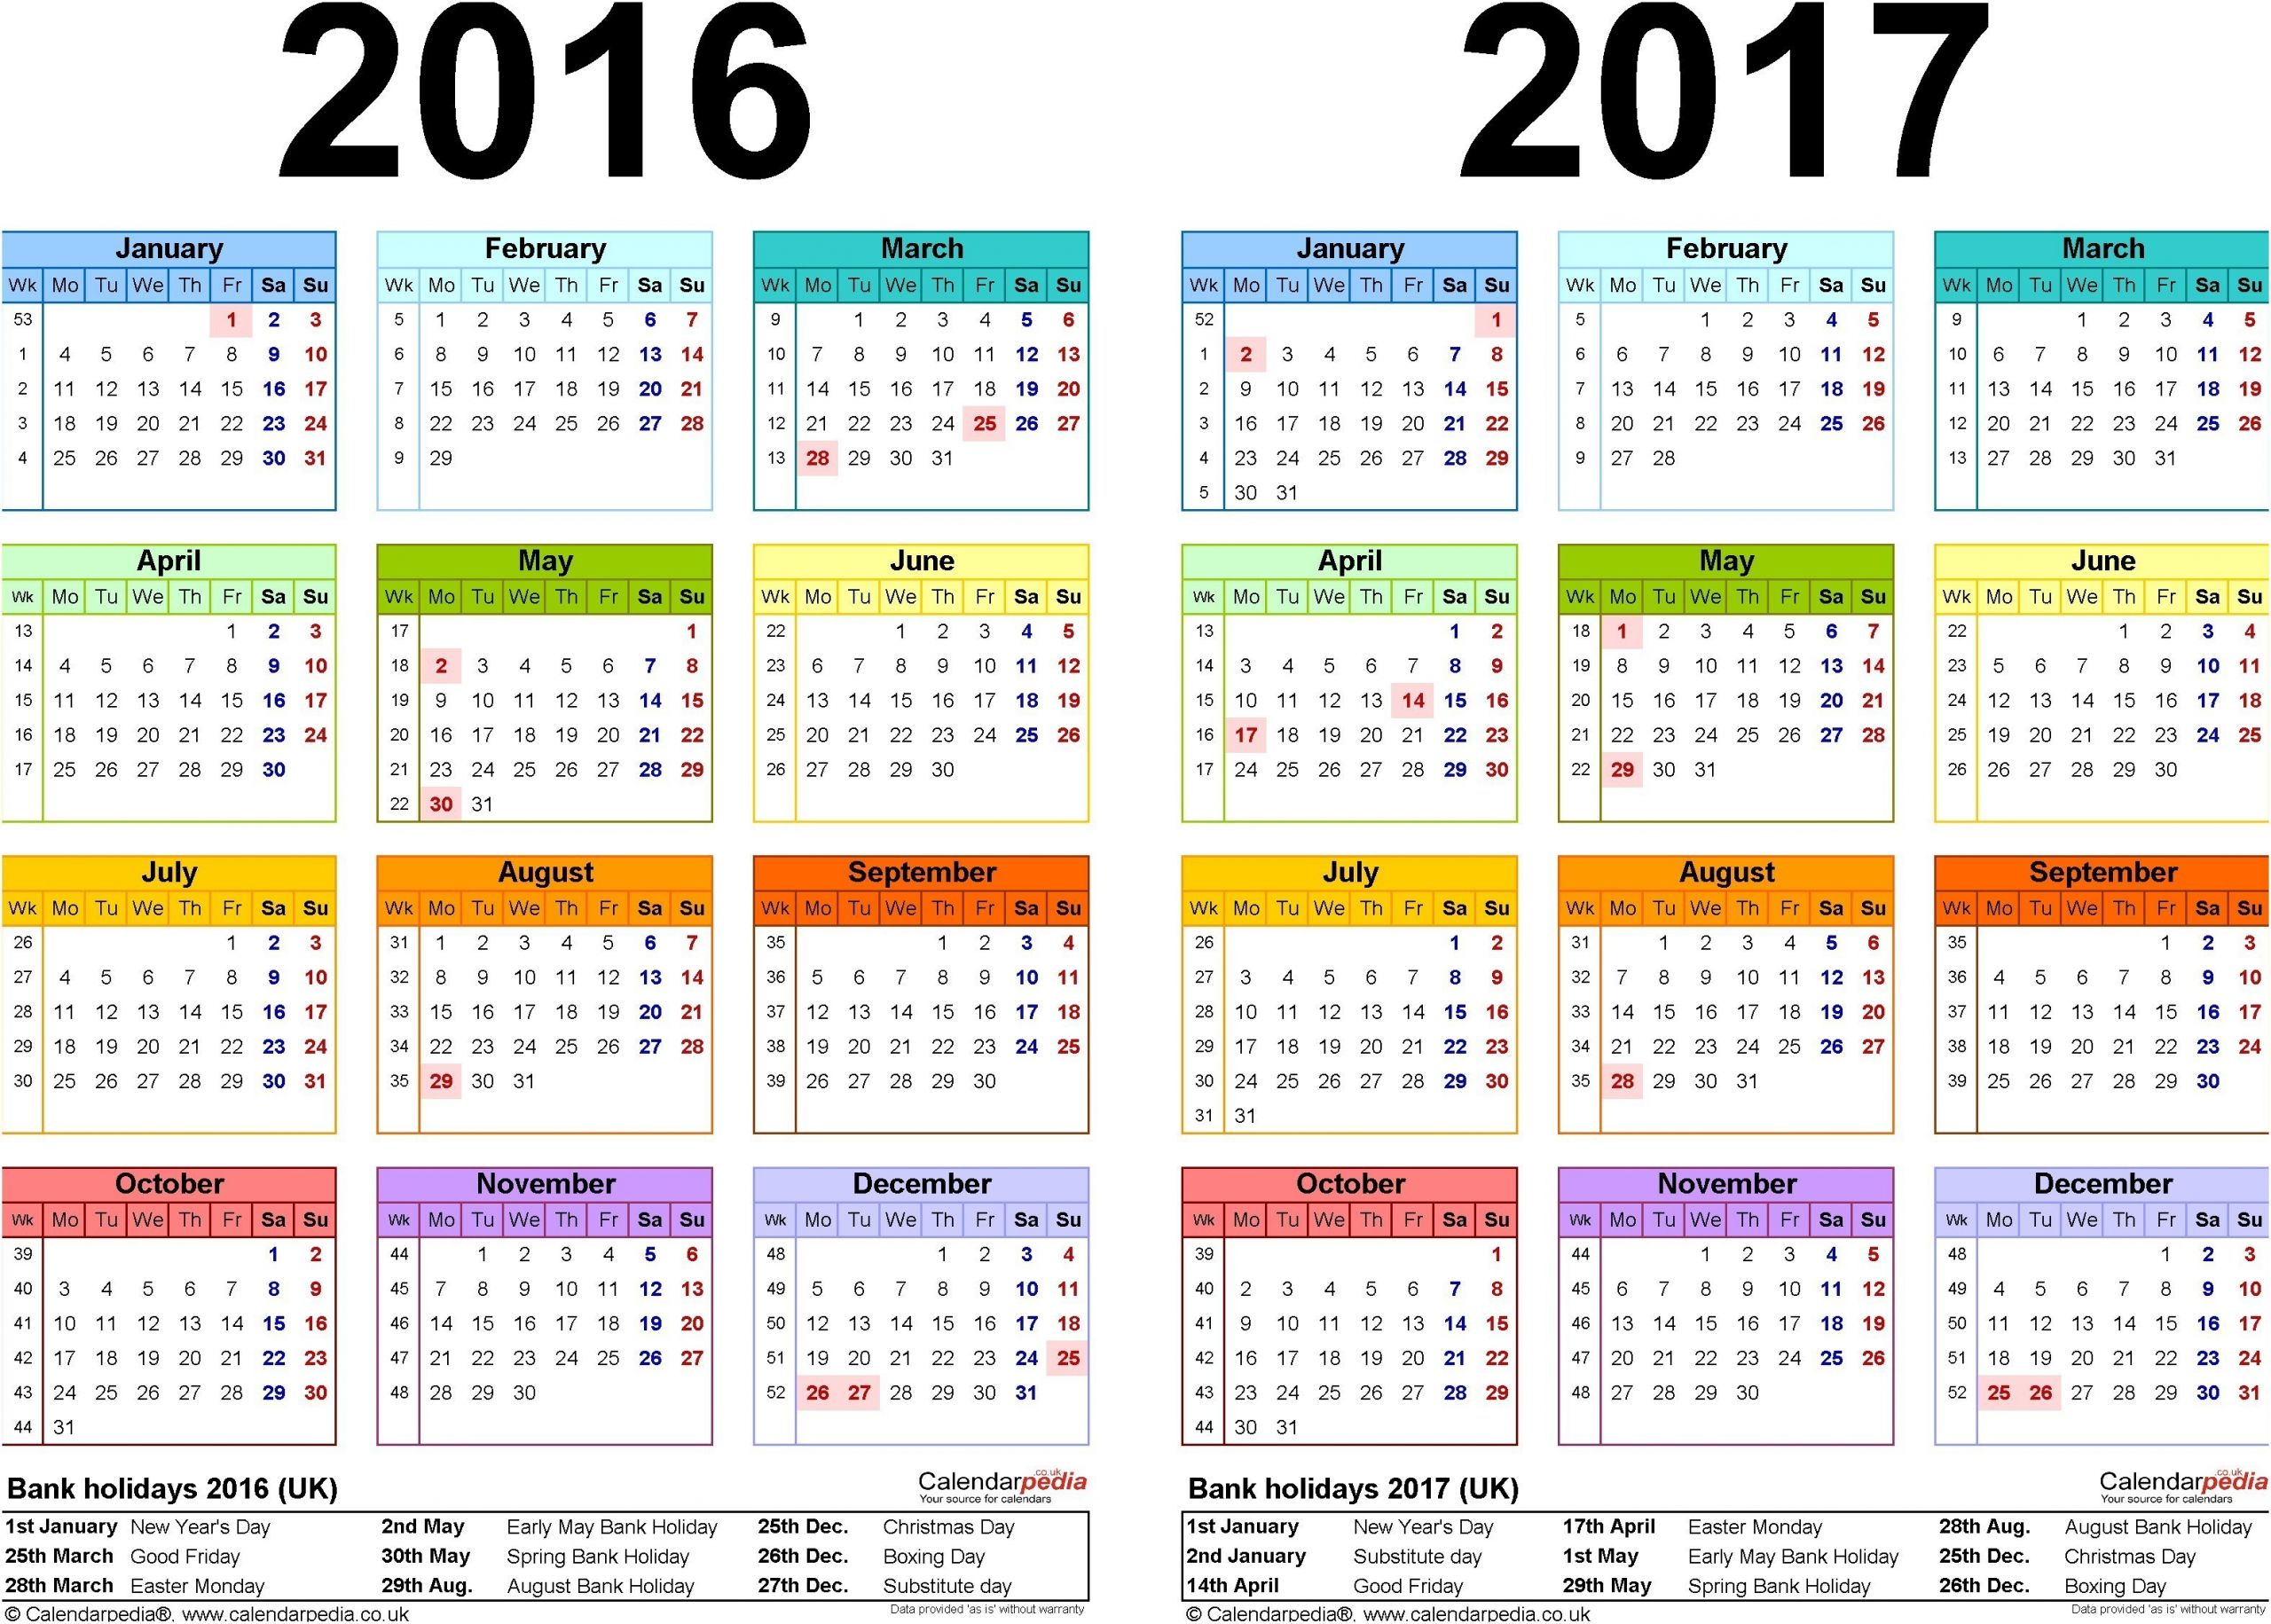 march 2018 calendar kalnirnay mas populares info intended for feb 2019 calendar kalnirnay calendar online 2019 of march 2018 calendar kalnirnay